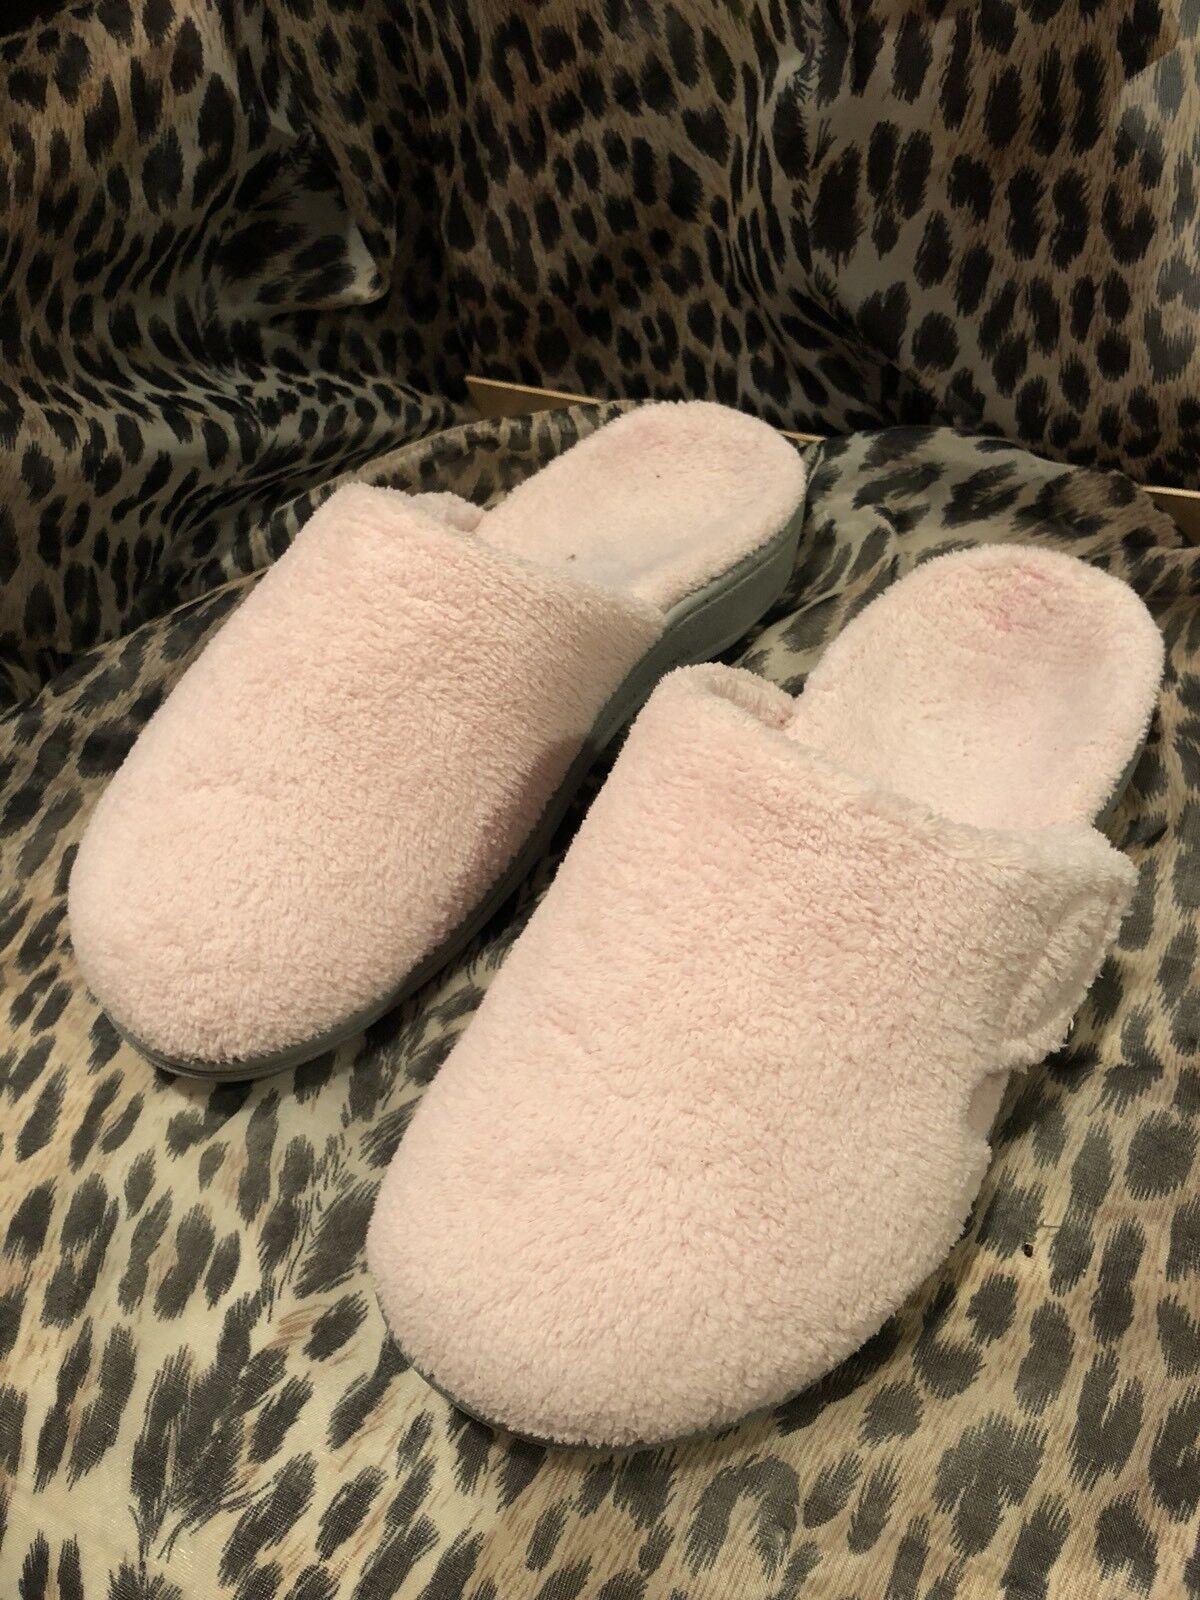 ORTHAHEEL 26GEMMA Orthaheel Womens Gemma Mule Slippers Pink Size 7 US 37-38 EU